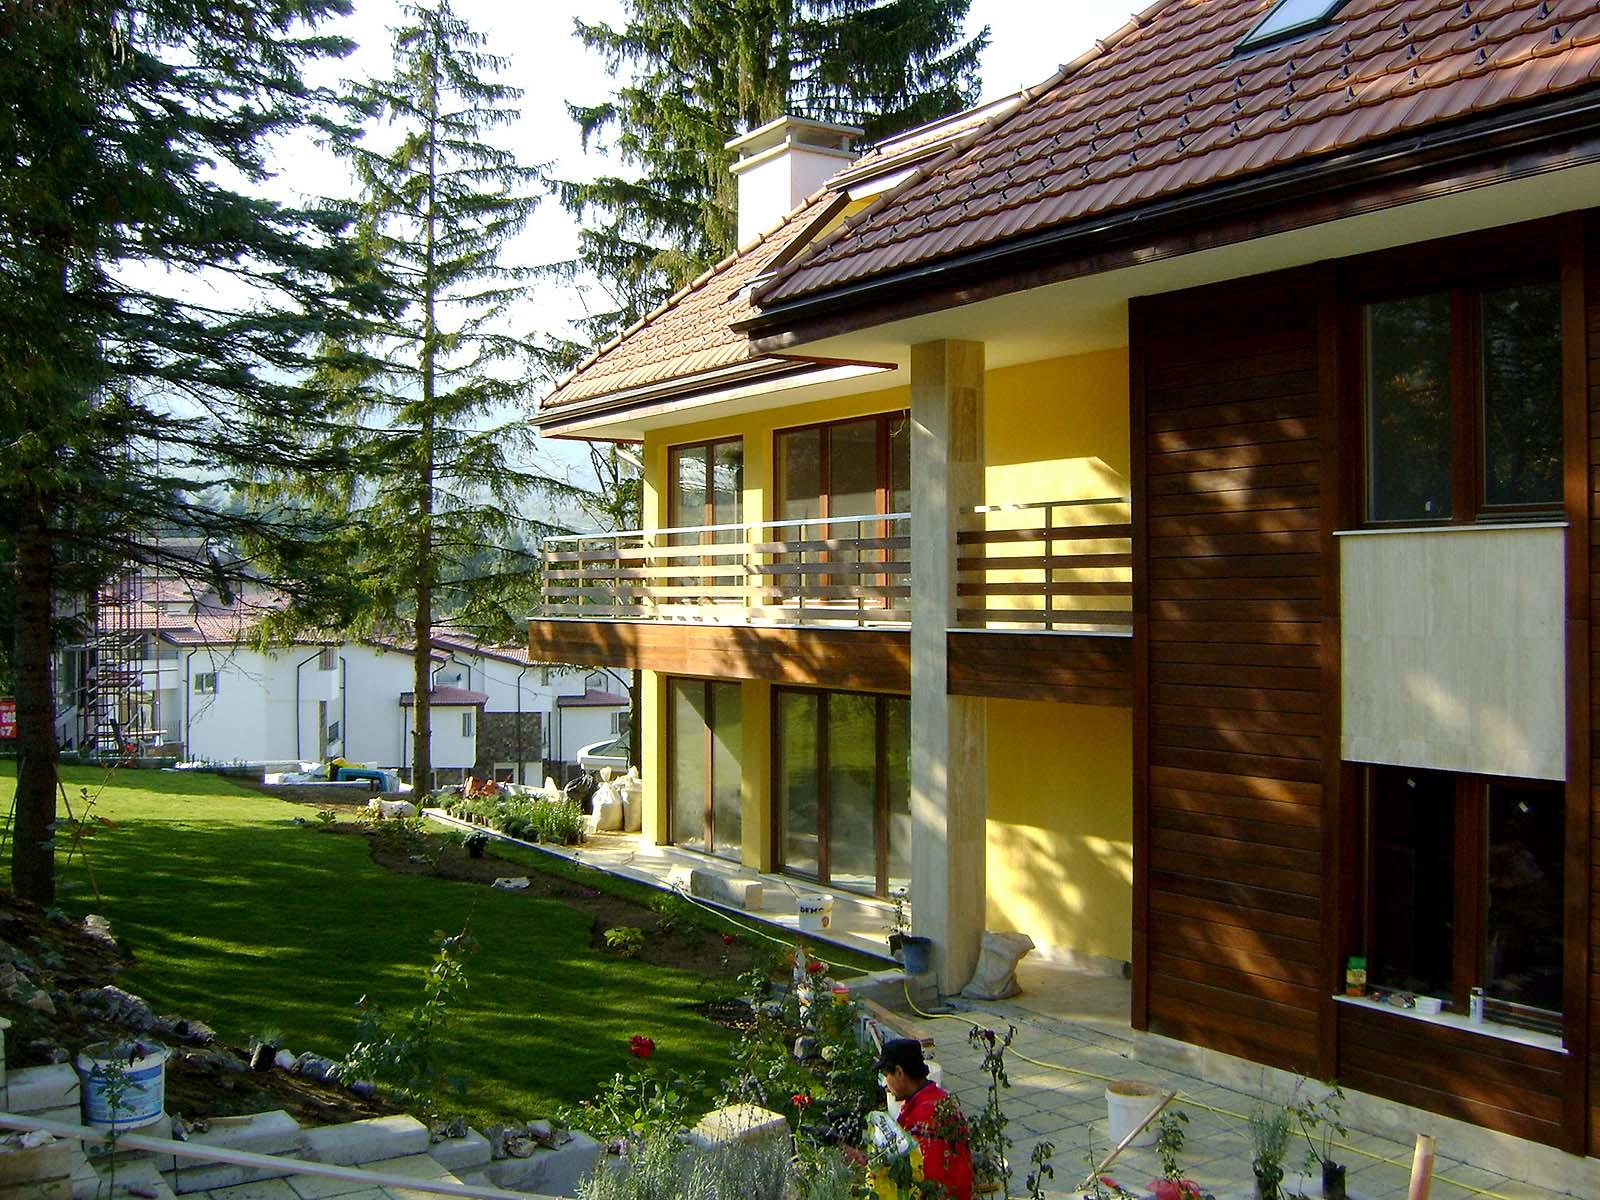 Single Family House, Dragalevtsi. Еднофамилна къща, Драгалевци 01